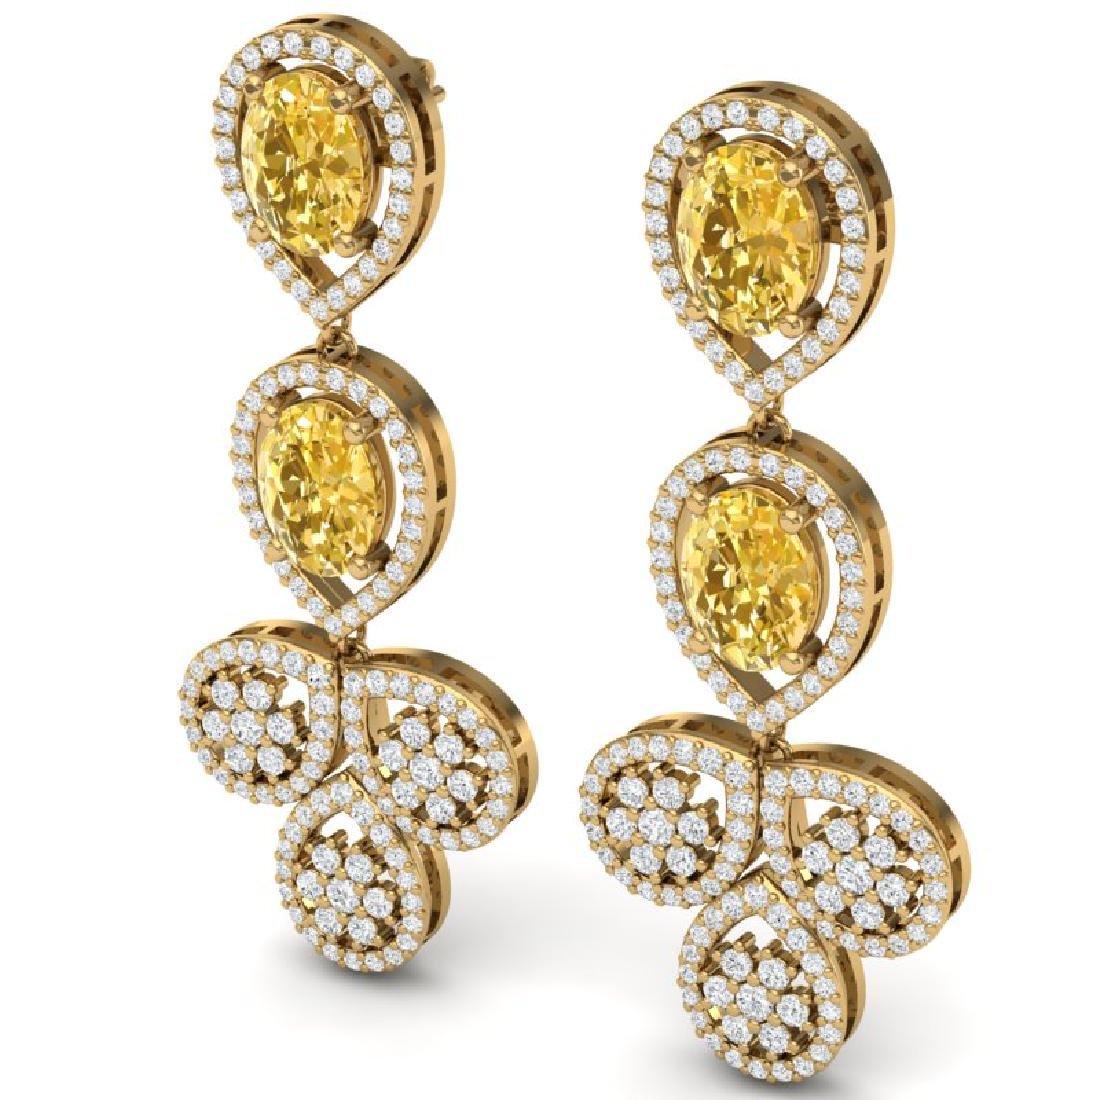 8.15 CTW Royalty Canary Citrine & VS Diamond Earrings - 2